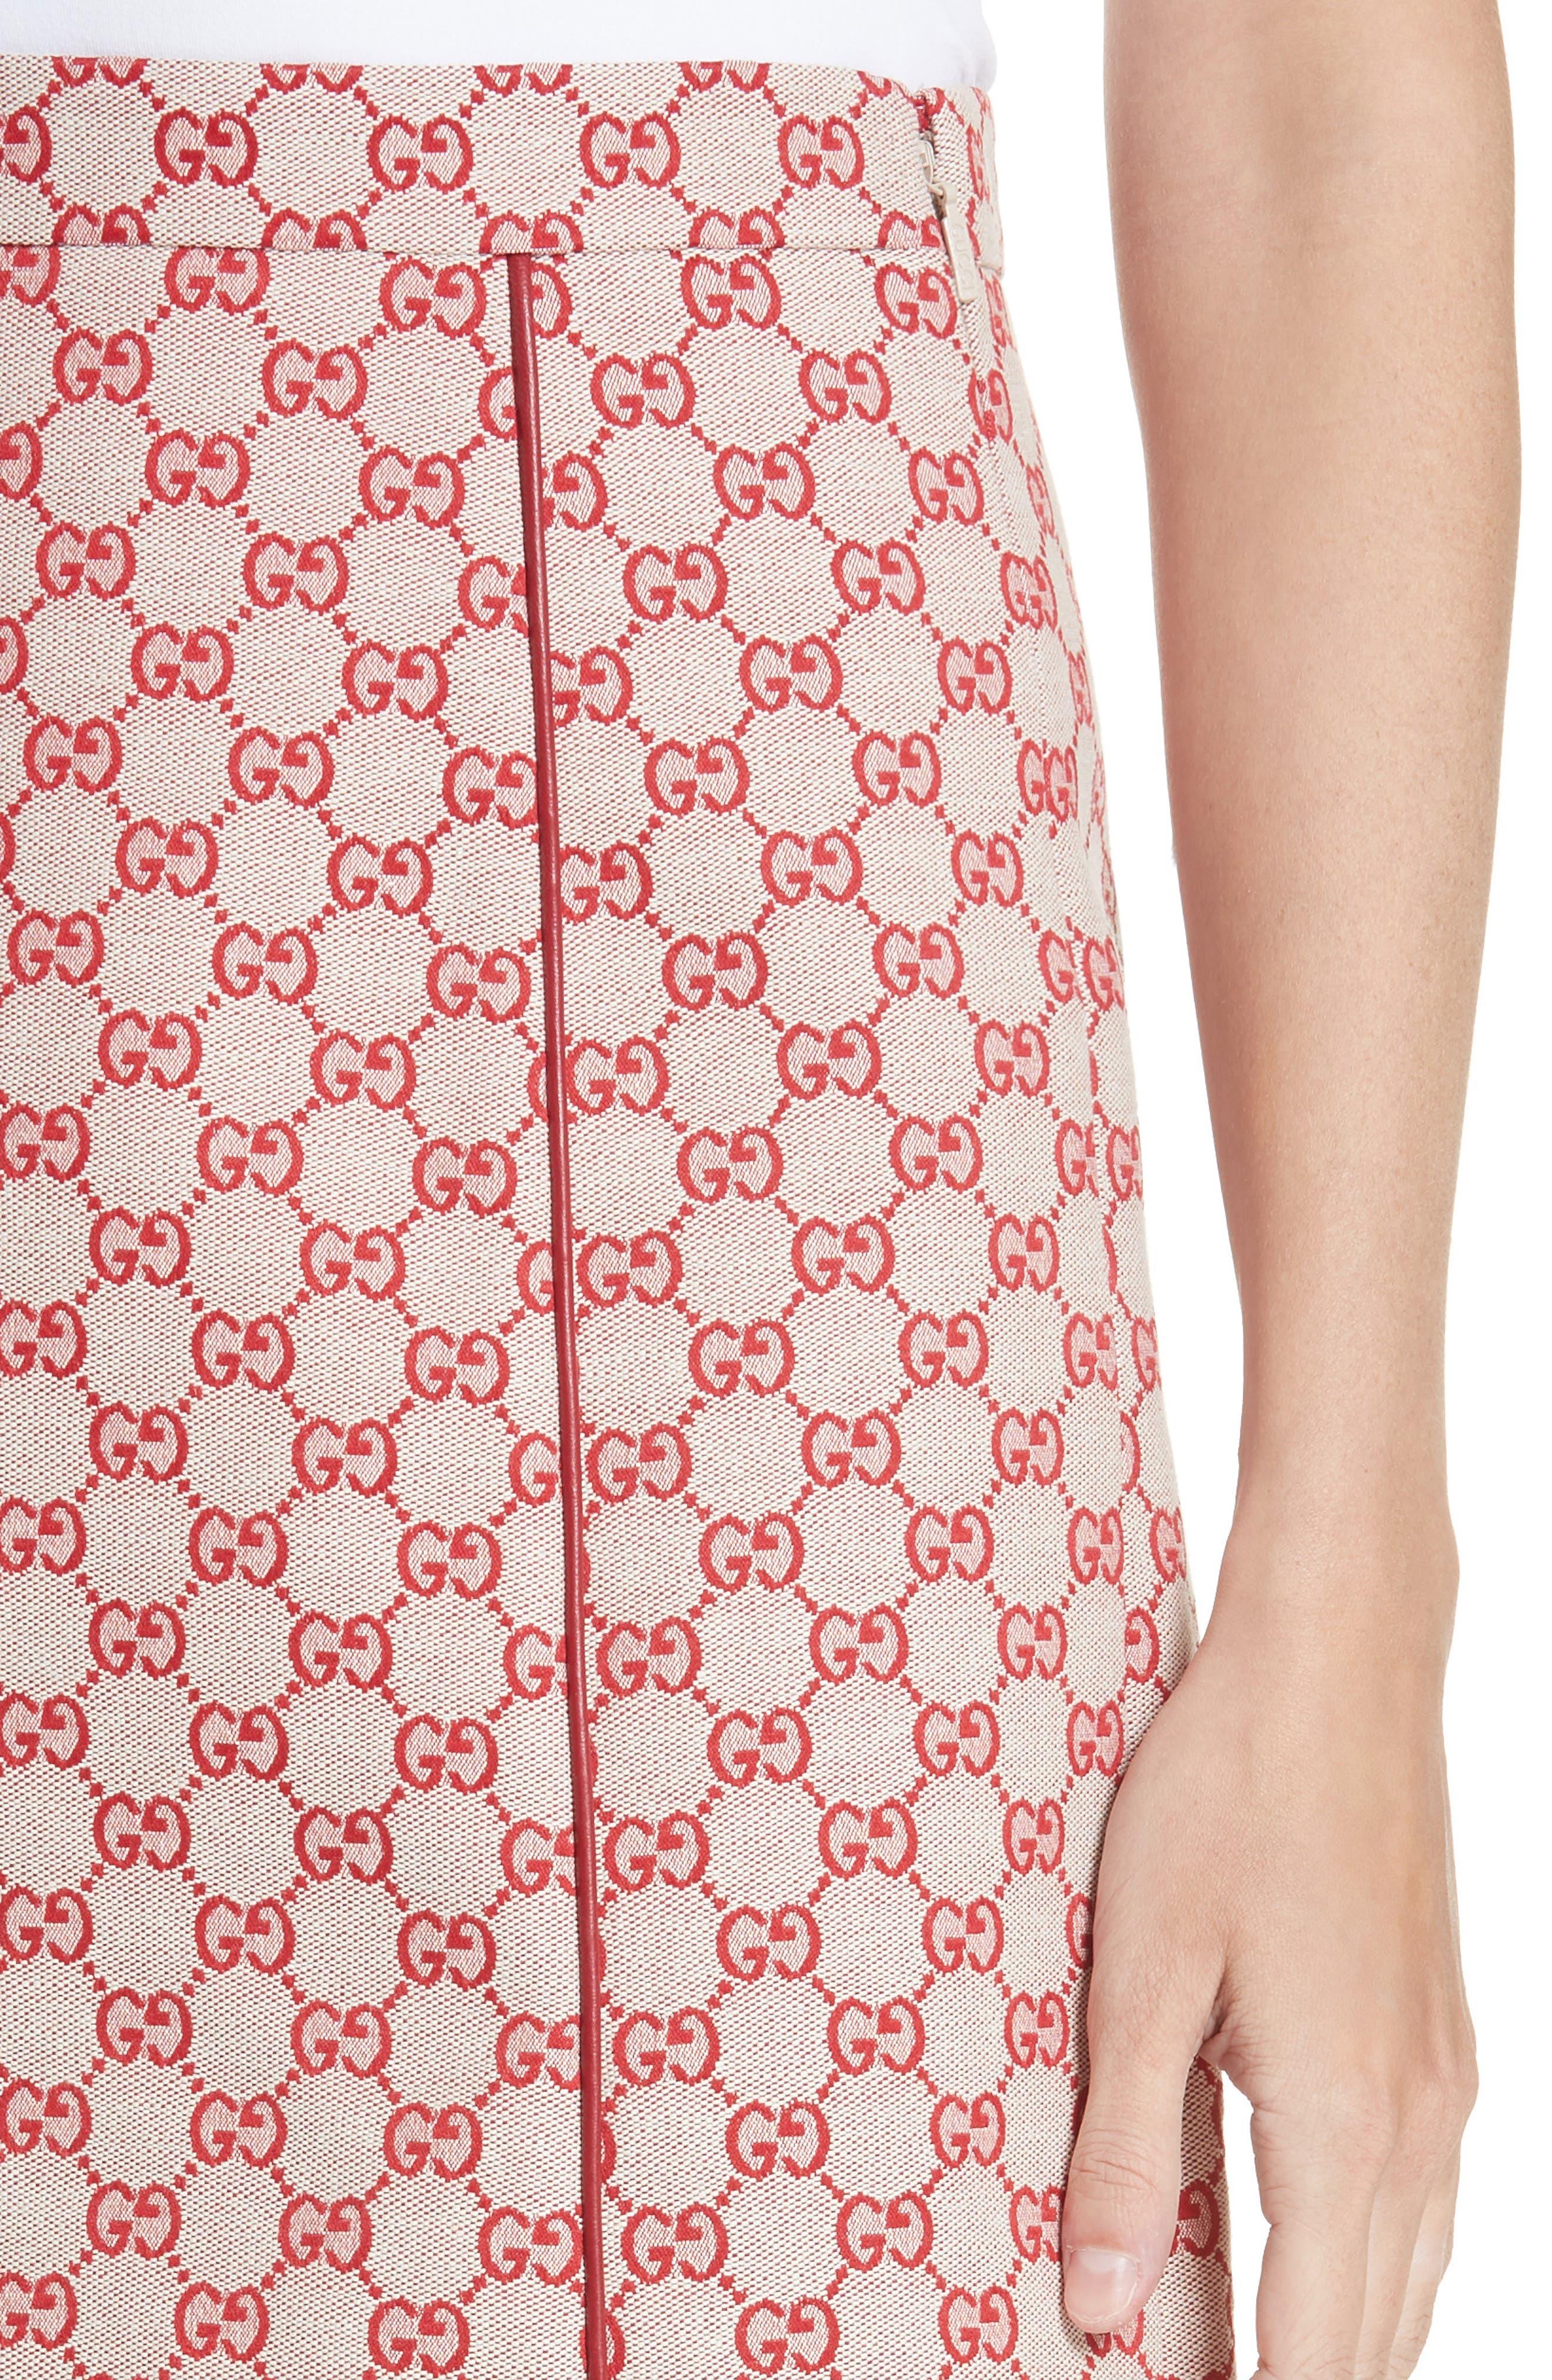 GG Print Canvas A-Line Skirt,                             Alternate thumbnail 4, color,                             GARDENIA/ HIBISCUS RED